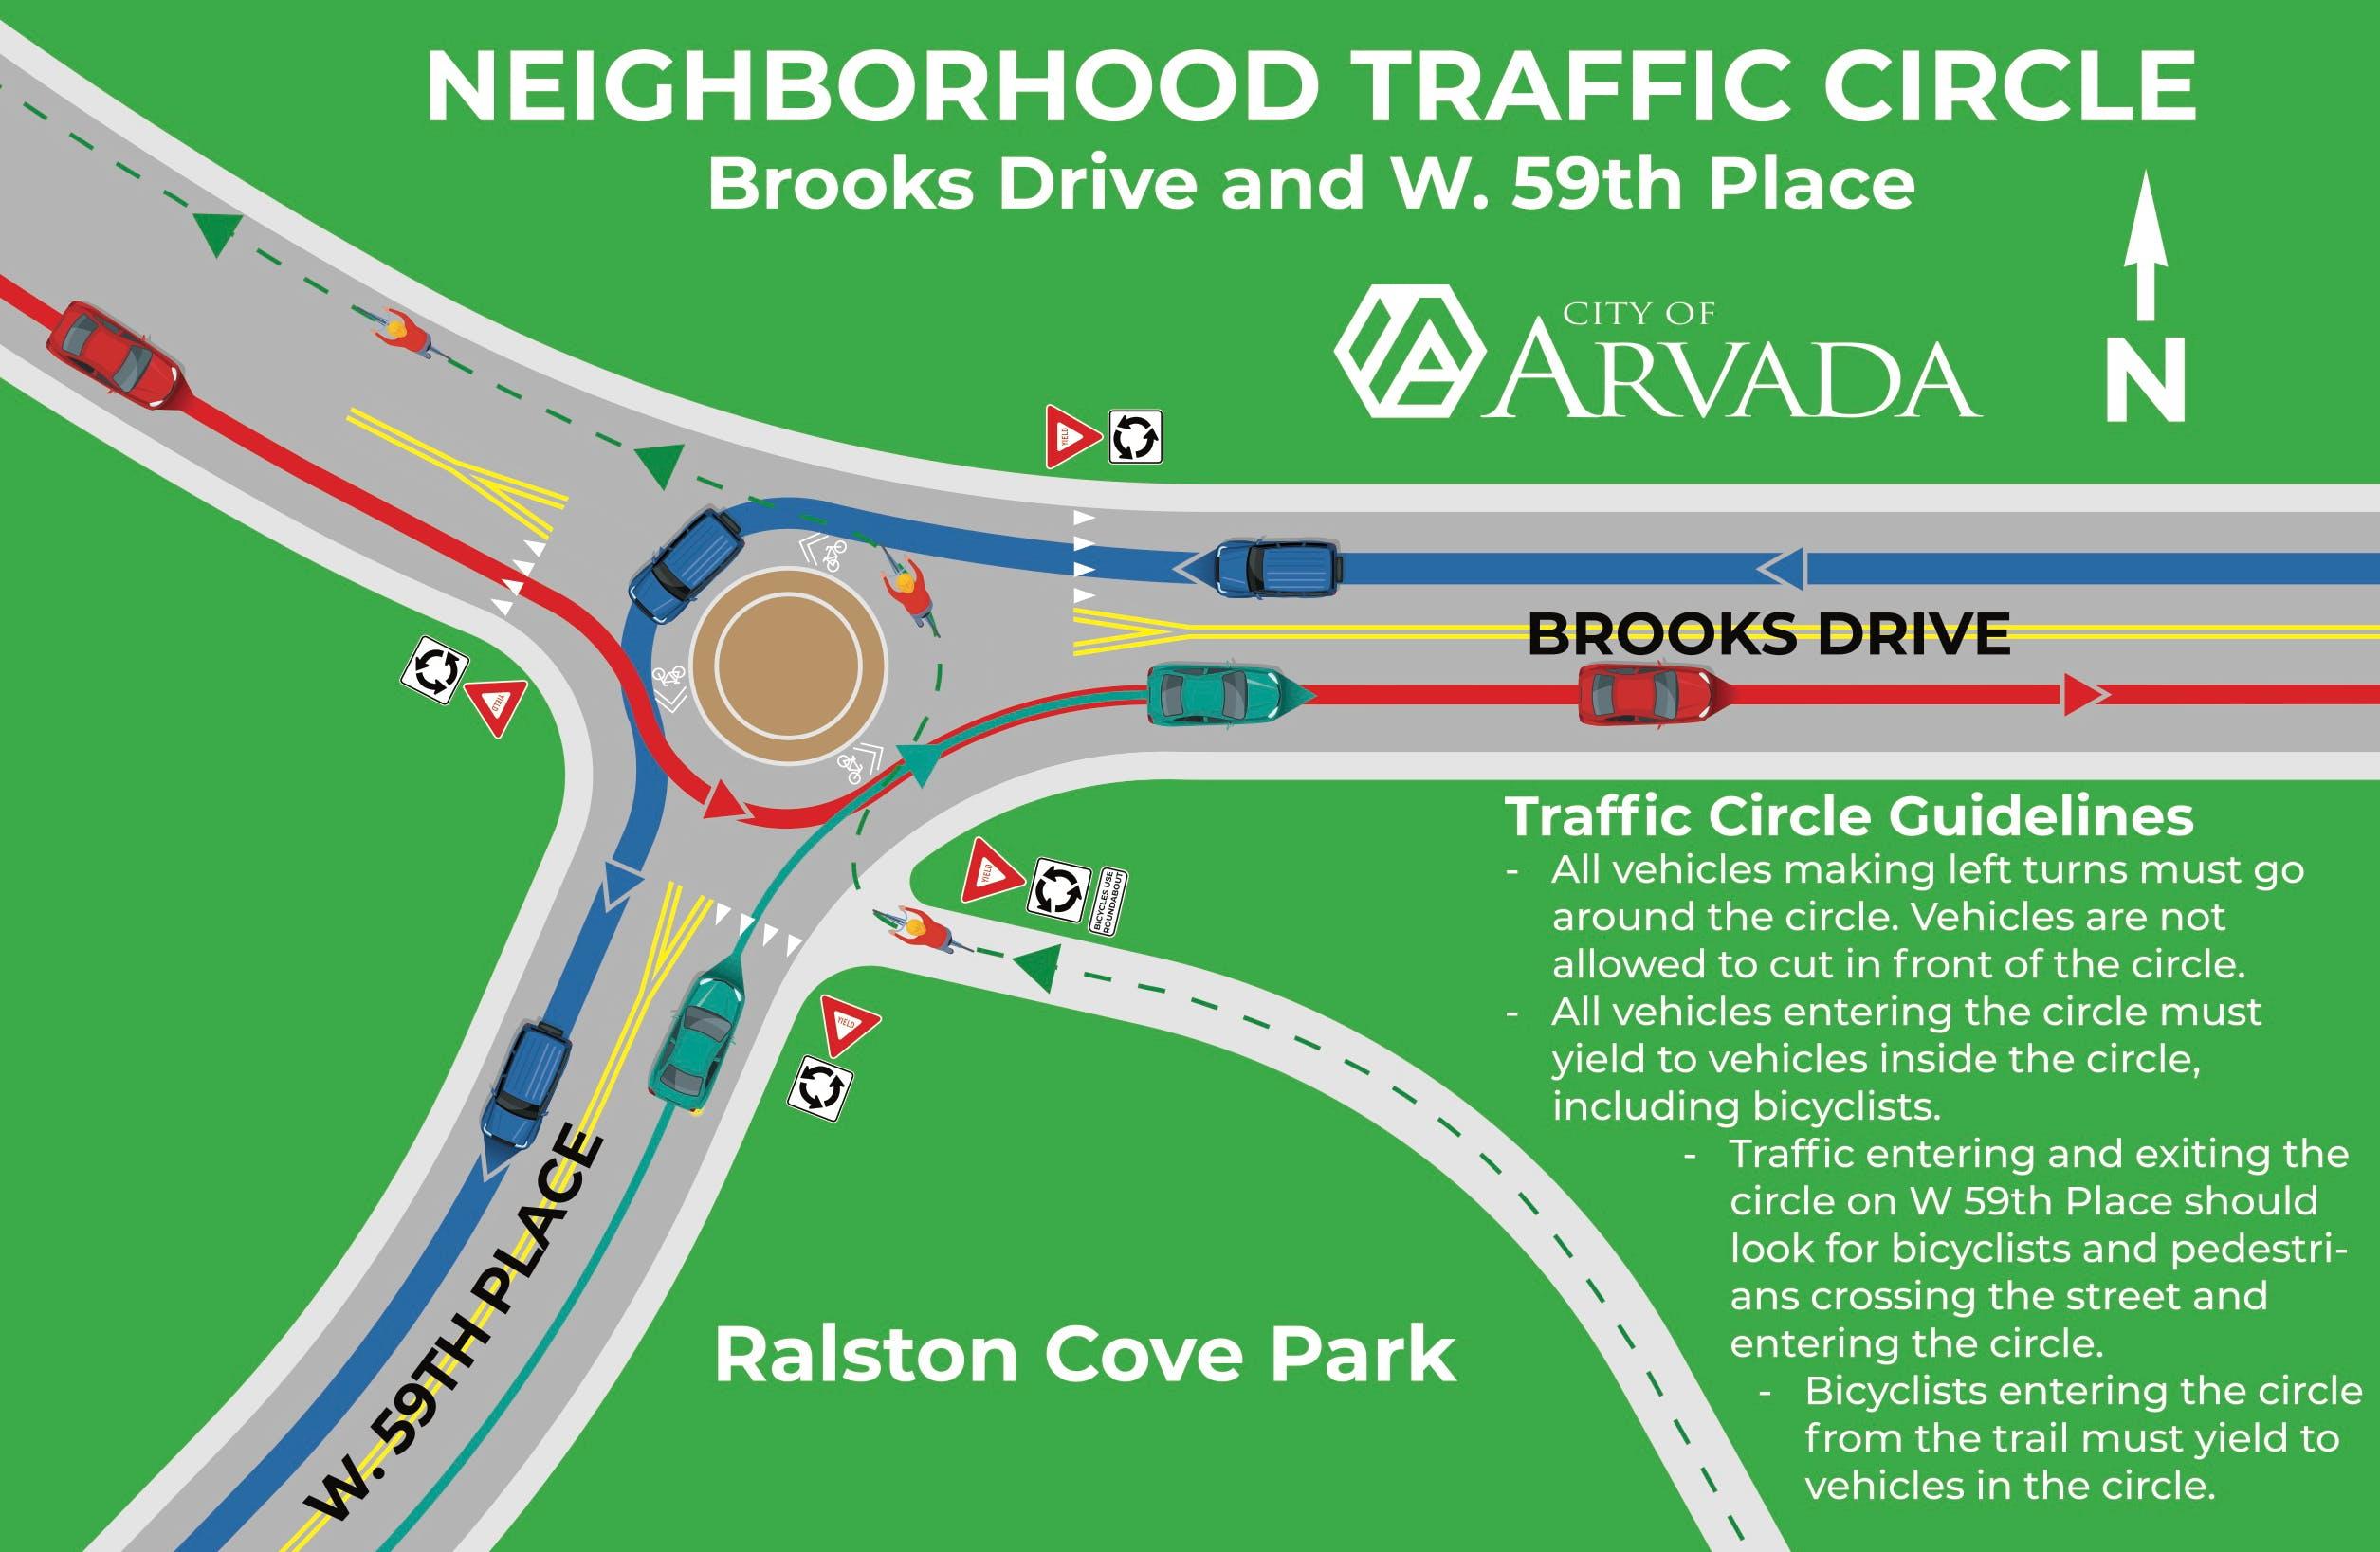 Map of neighborhood traffic circle